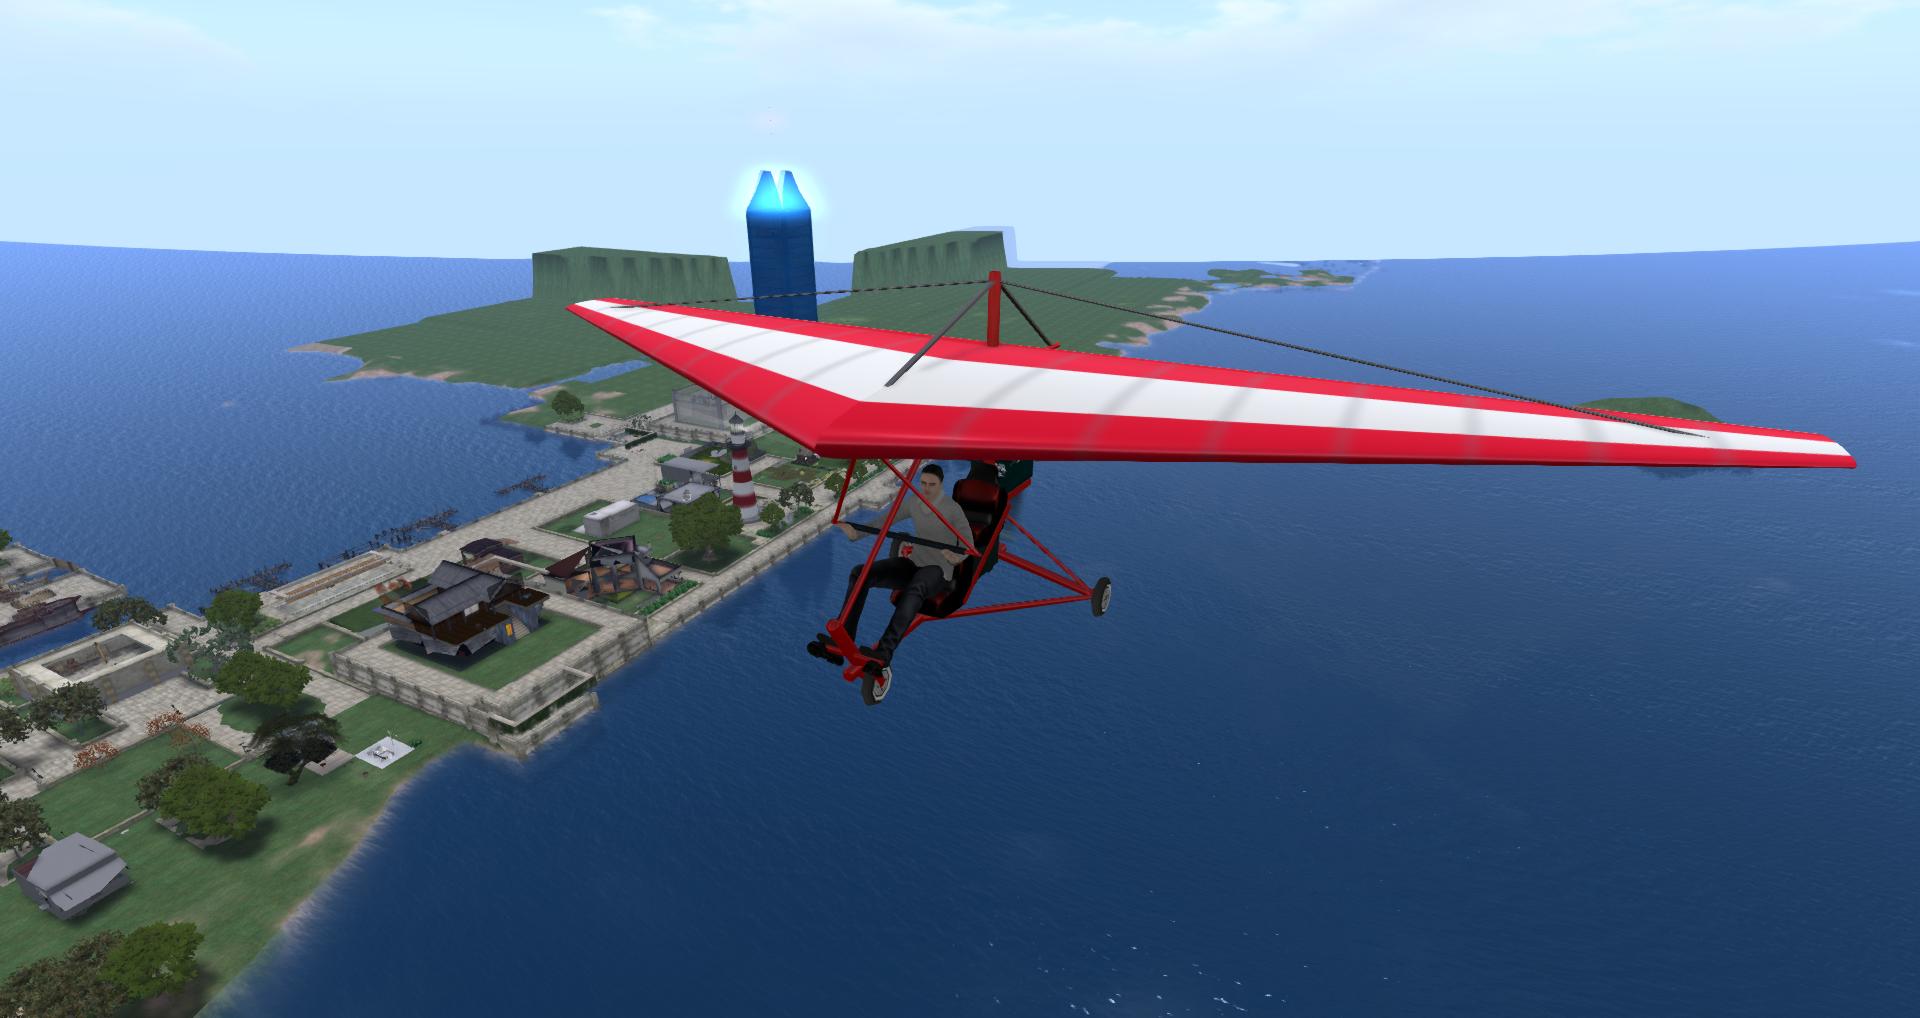 Velocity Trike Ultralight | Second Life Aviation Wiki | FANDOM